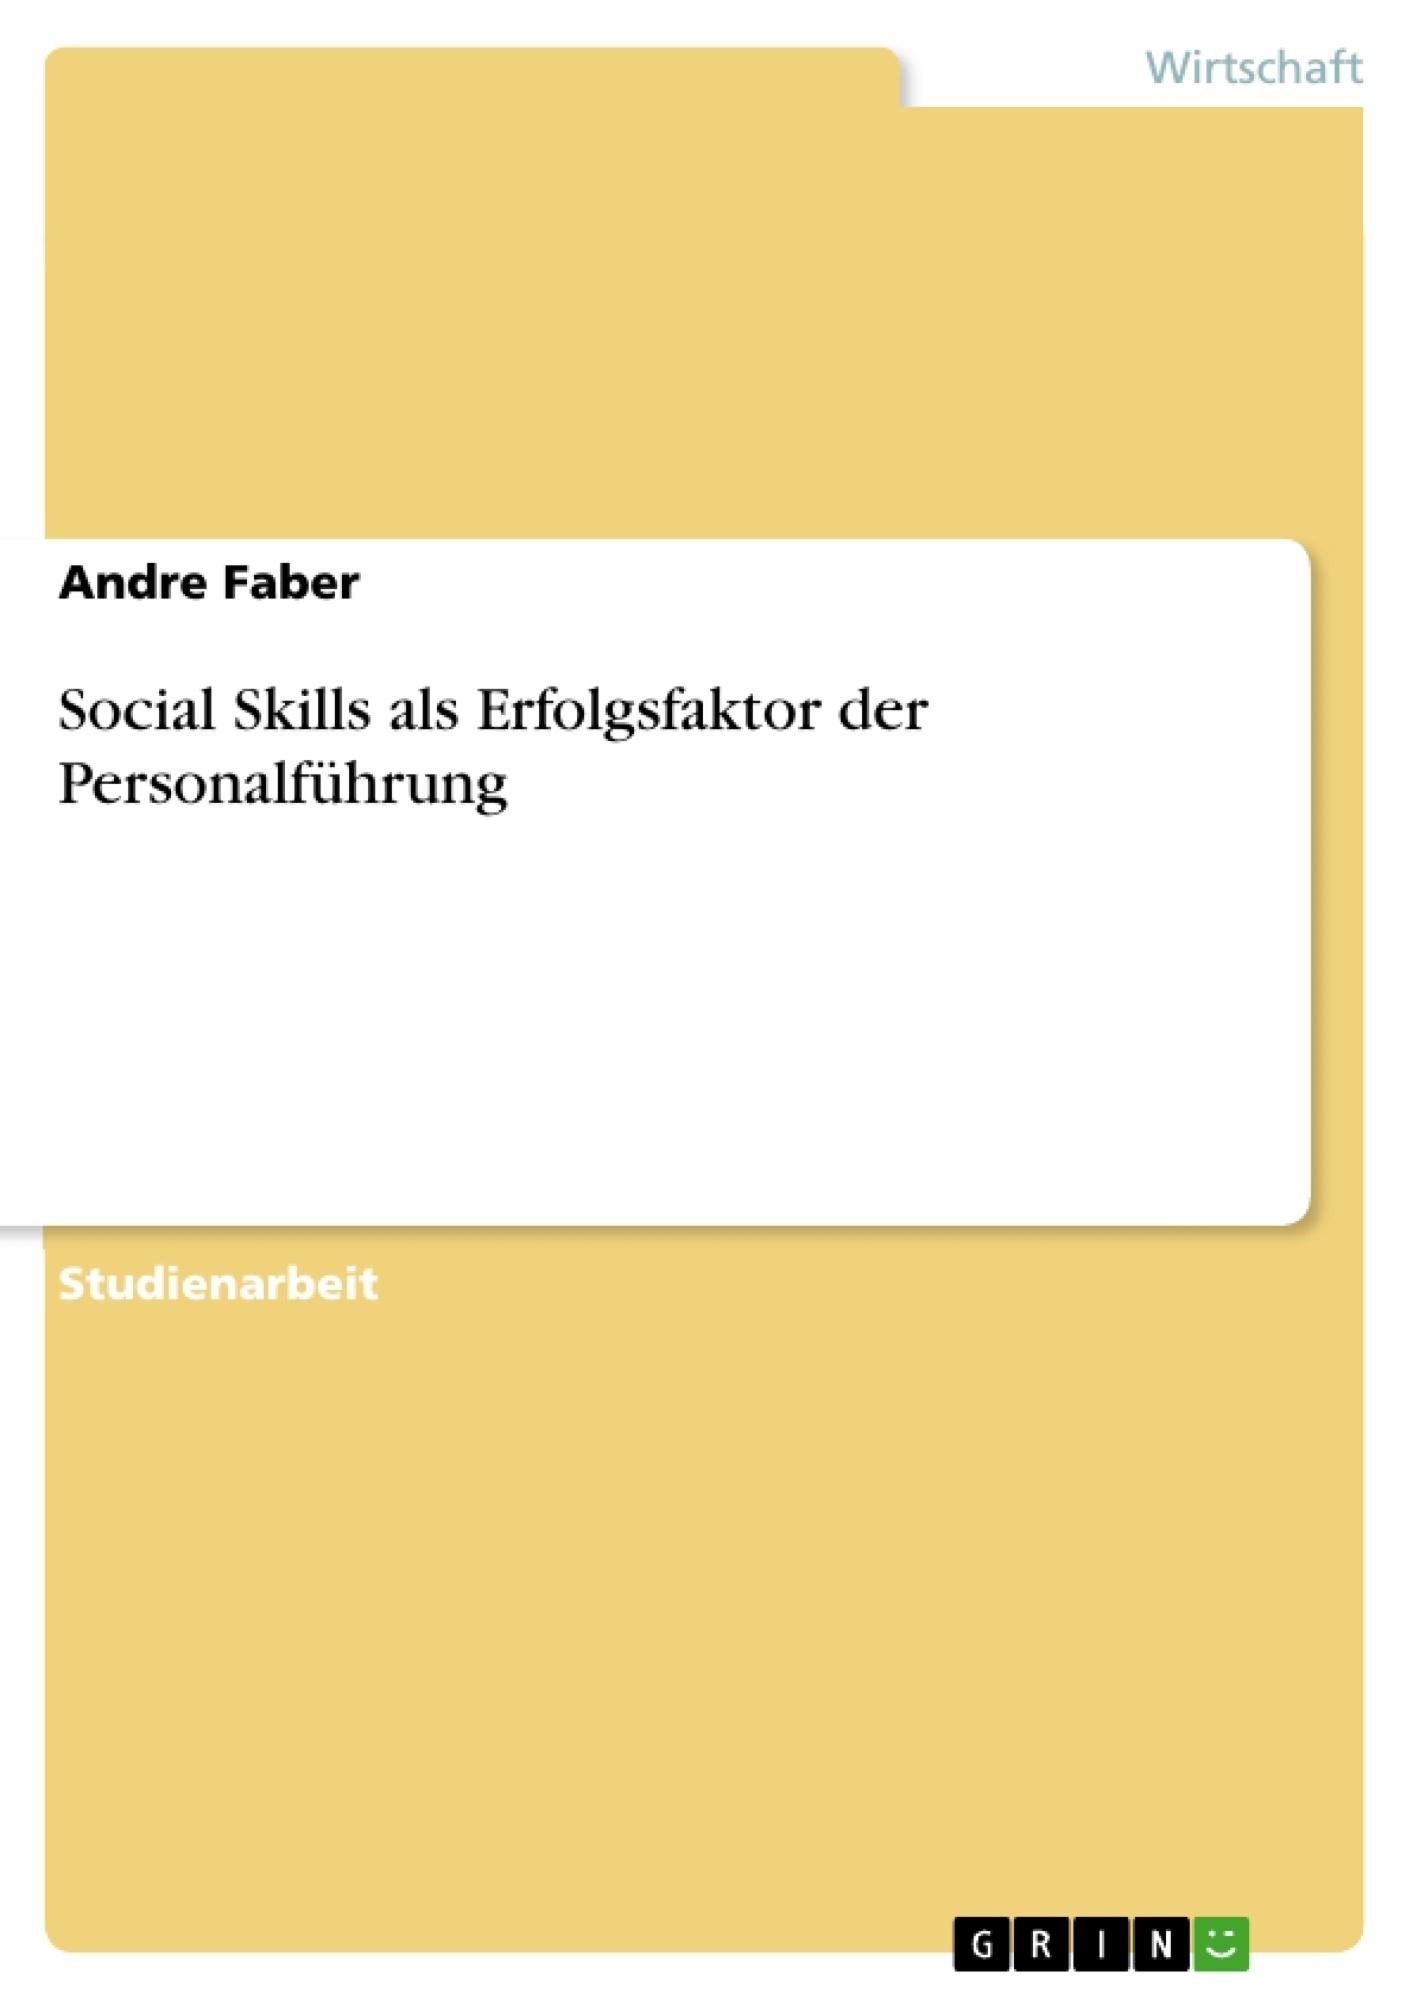 Titel: Social Skills als Erfolgsfaktor der Personalführung